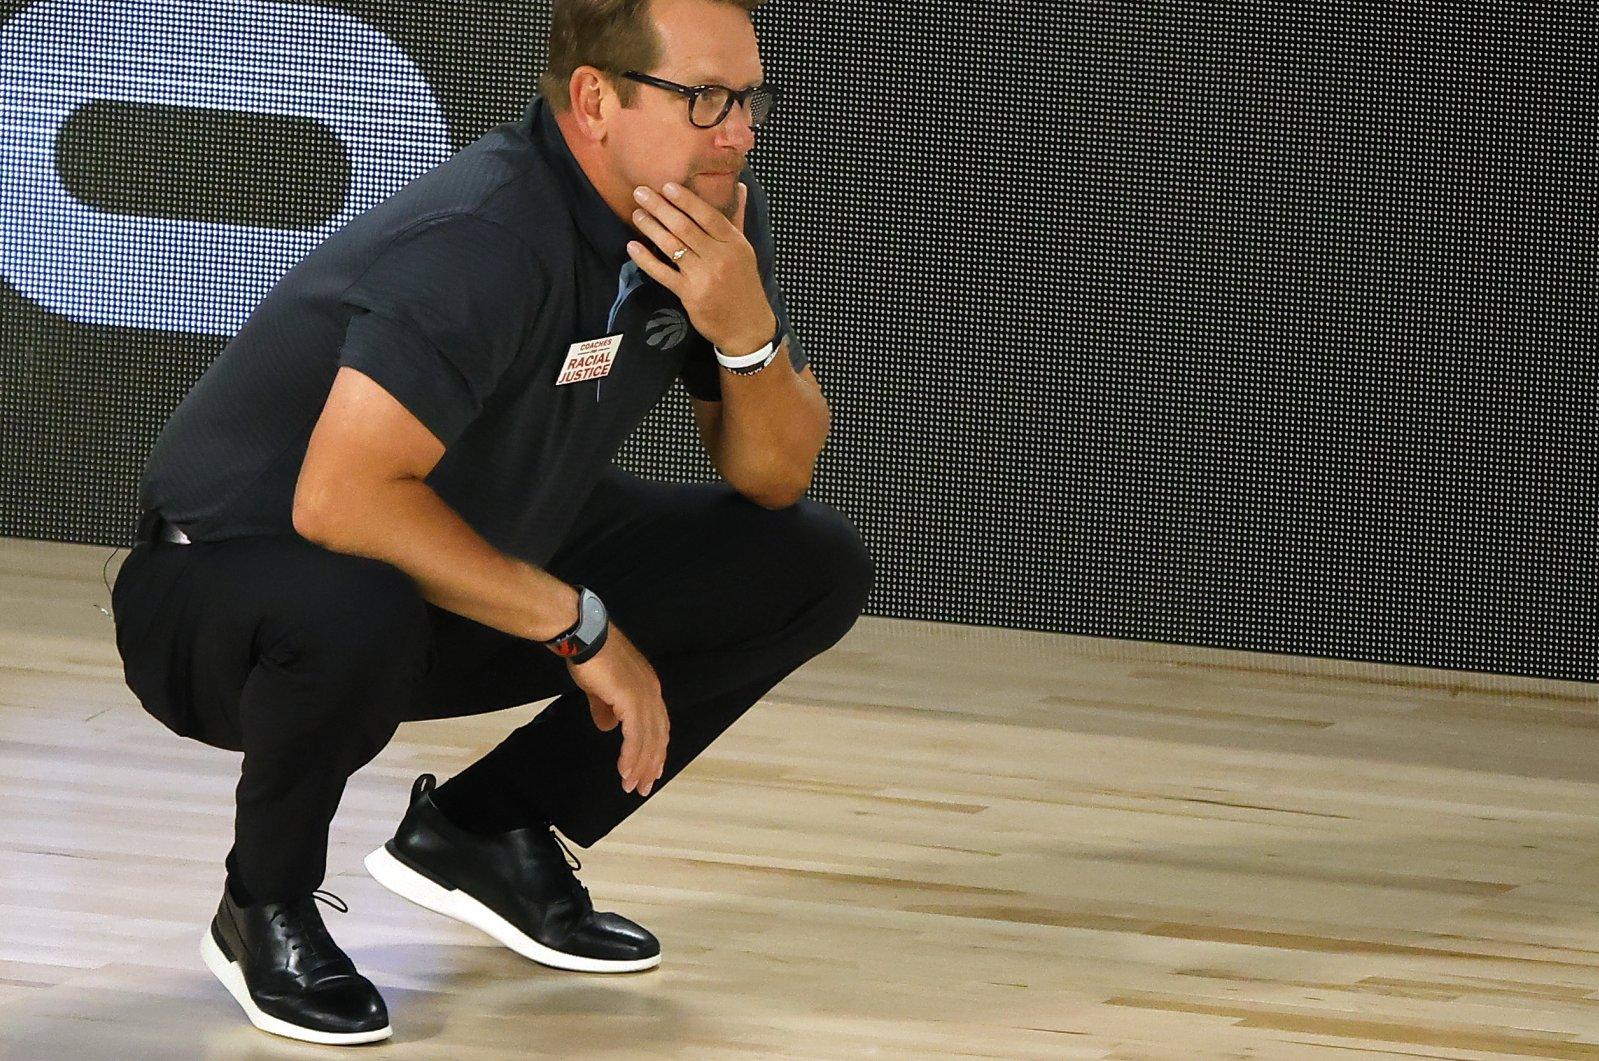 Toronto Raptors head coach Nick Nurse looks on during an NBA game against the Brooklyn Nets, in Lake Buena Vista, Florida, U.S., Aug. 19, 2020. (AP Photo)